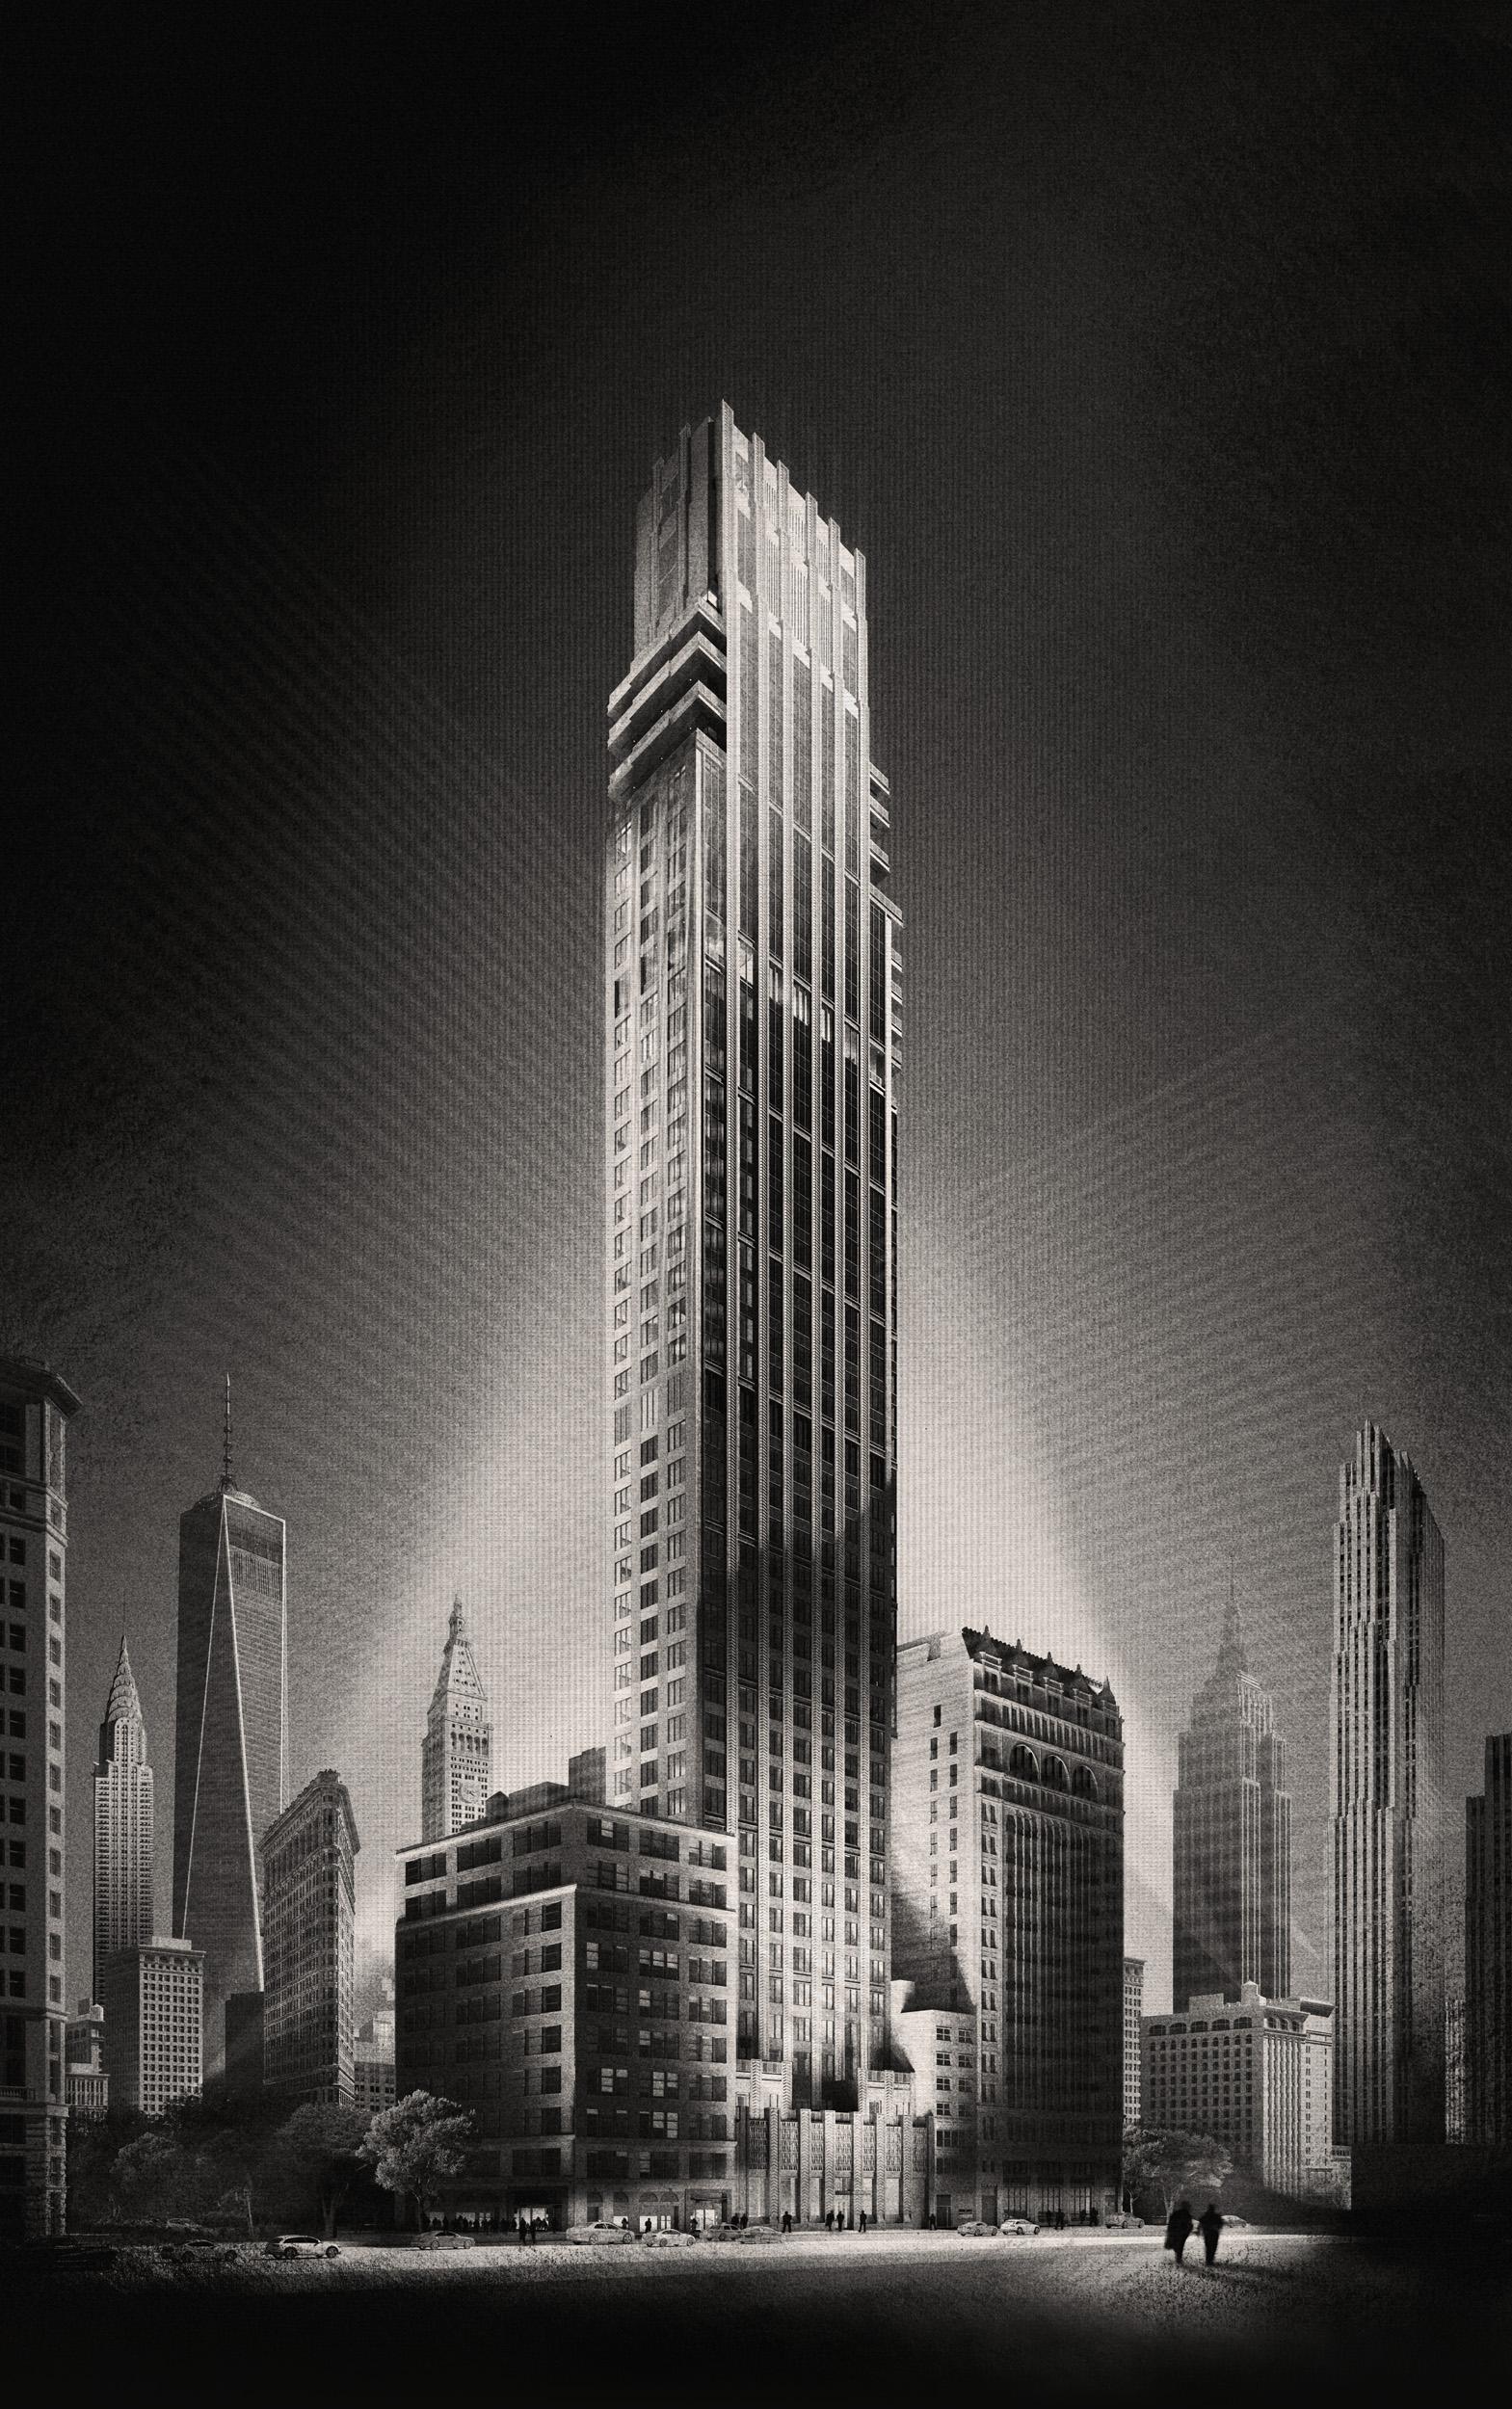 A tall skyscraper.